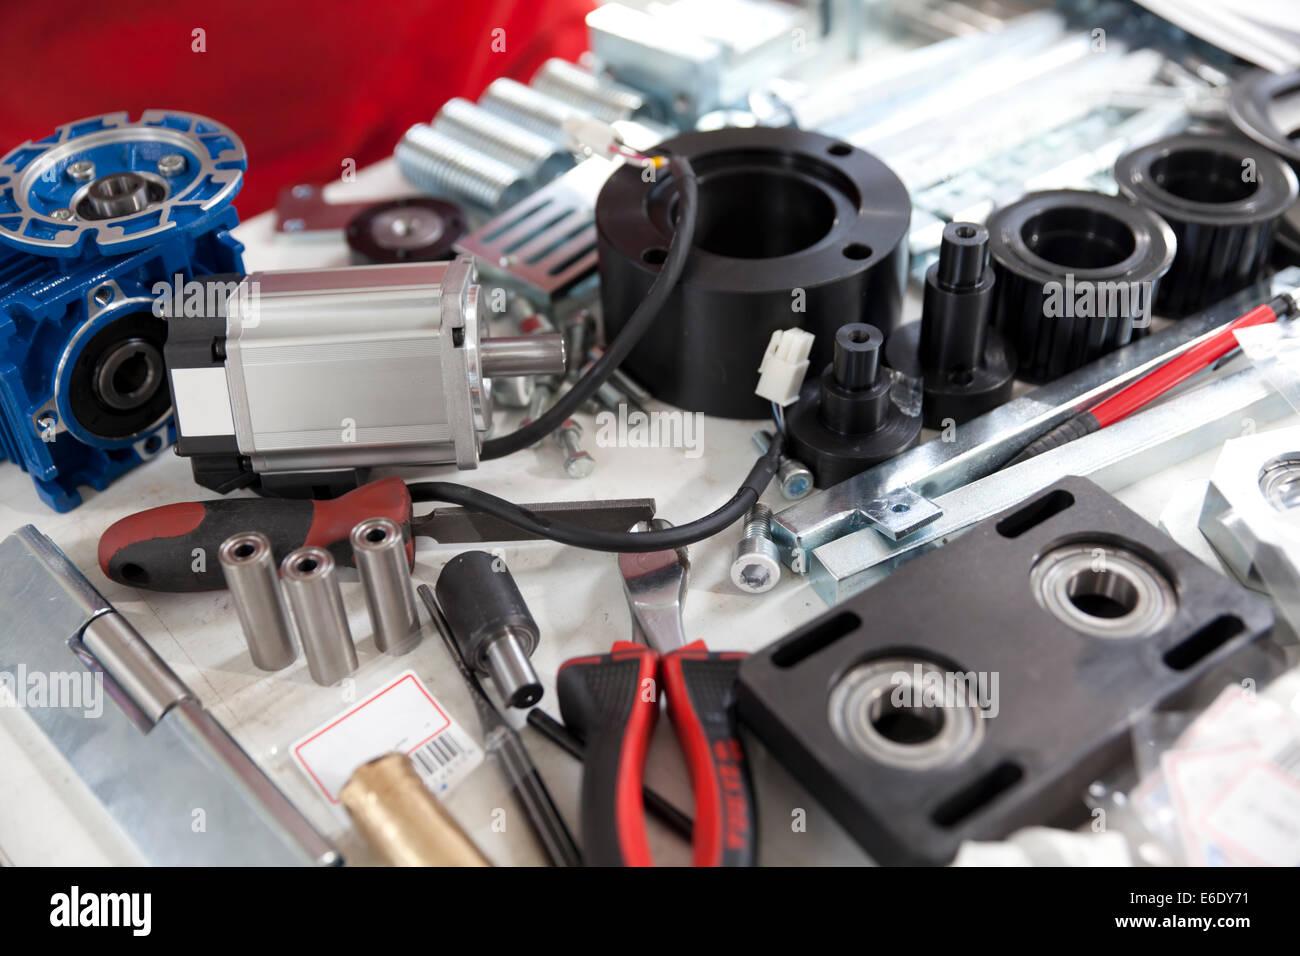 Engine Parts Stockfotos & Engine Parts Bilder - Alamy